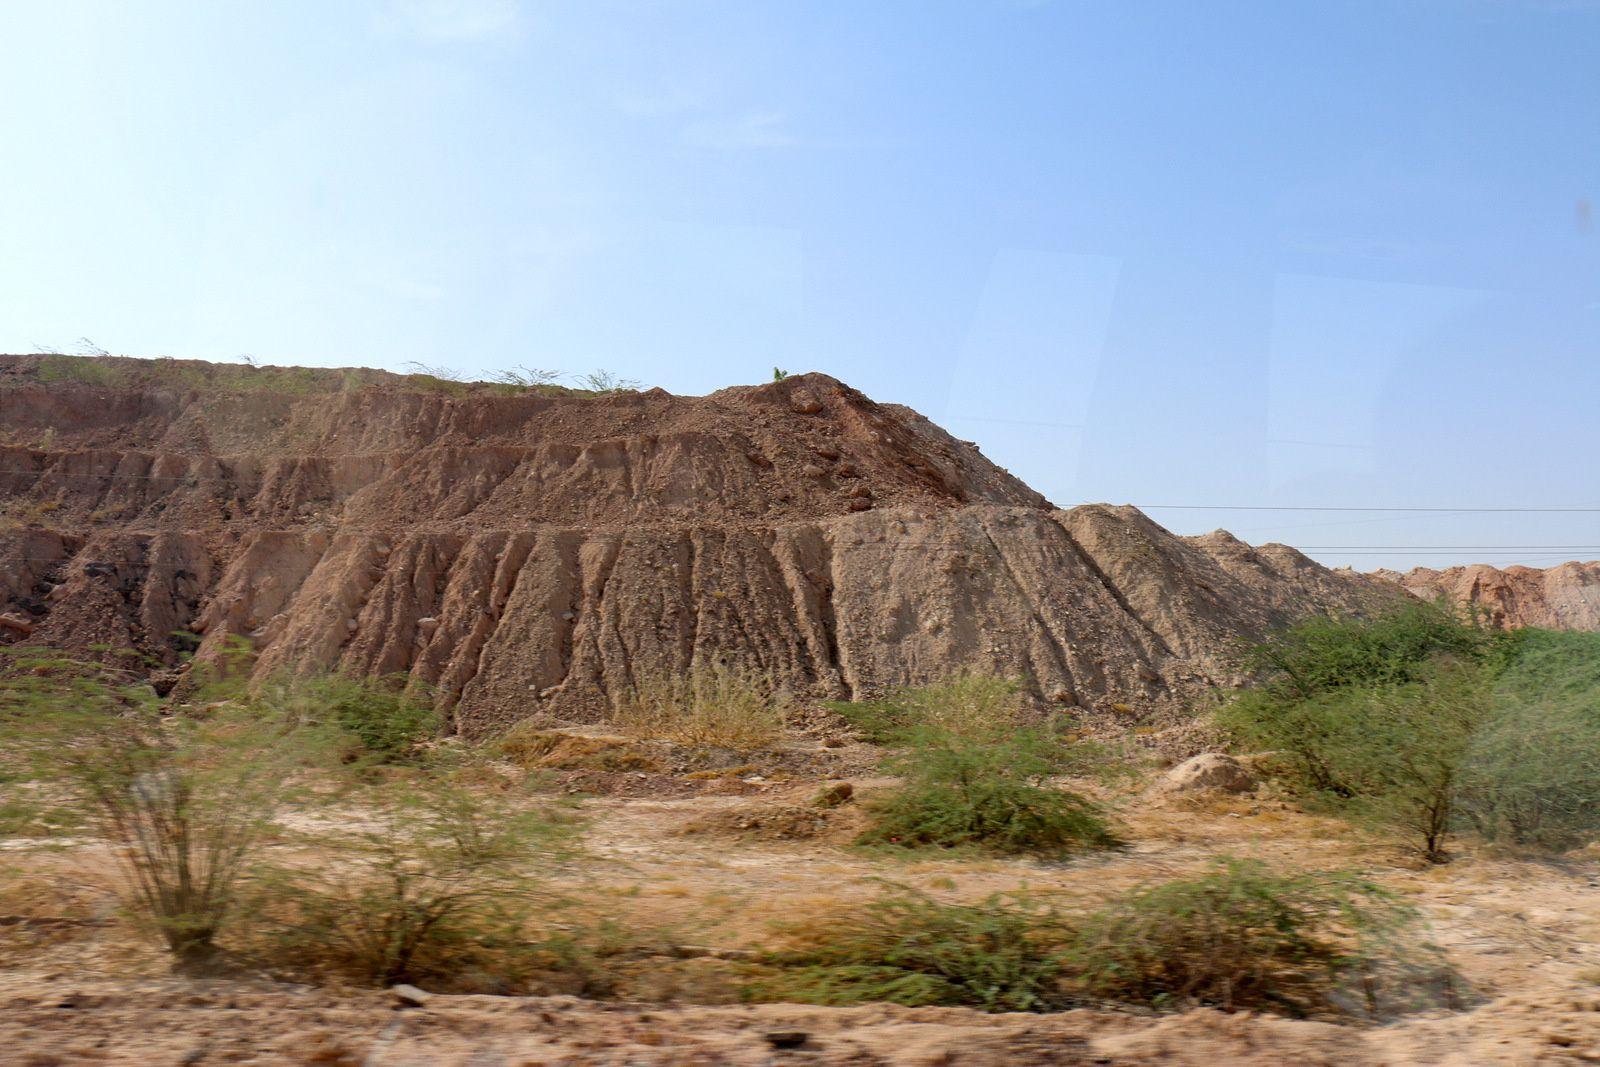 Désert du Thar, Rajasthan (Inde)